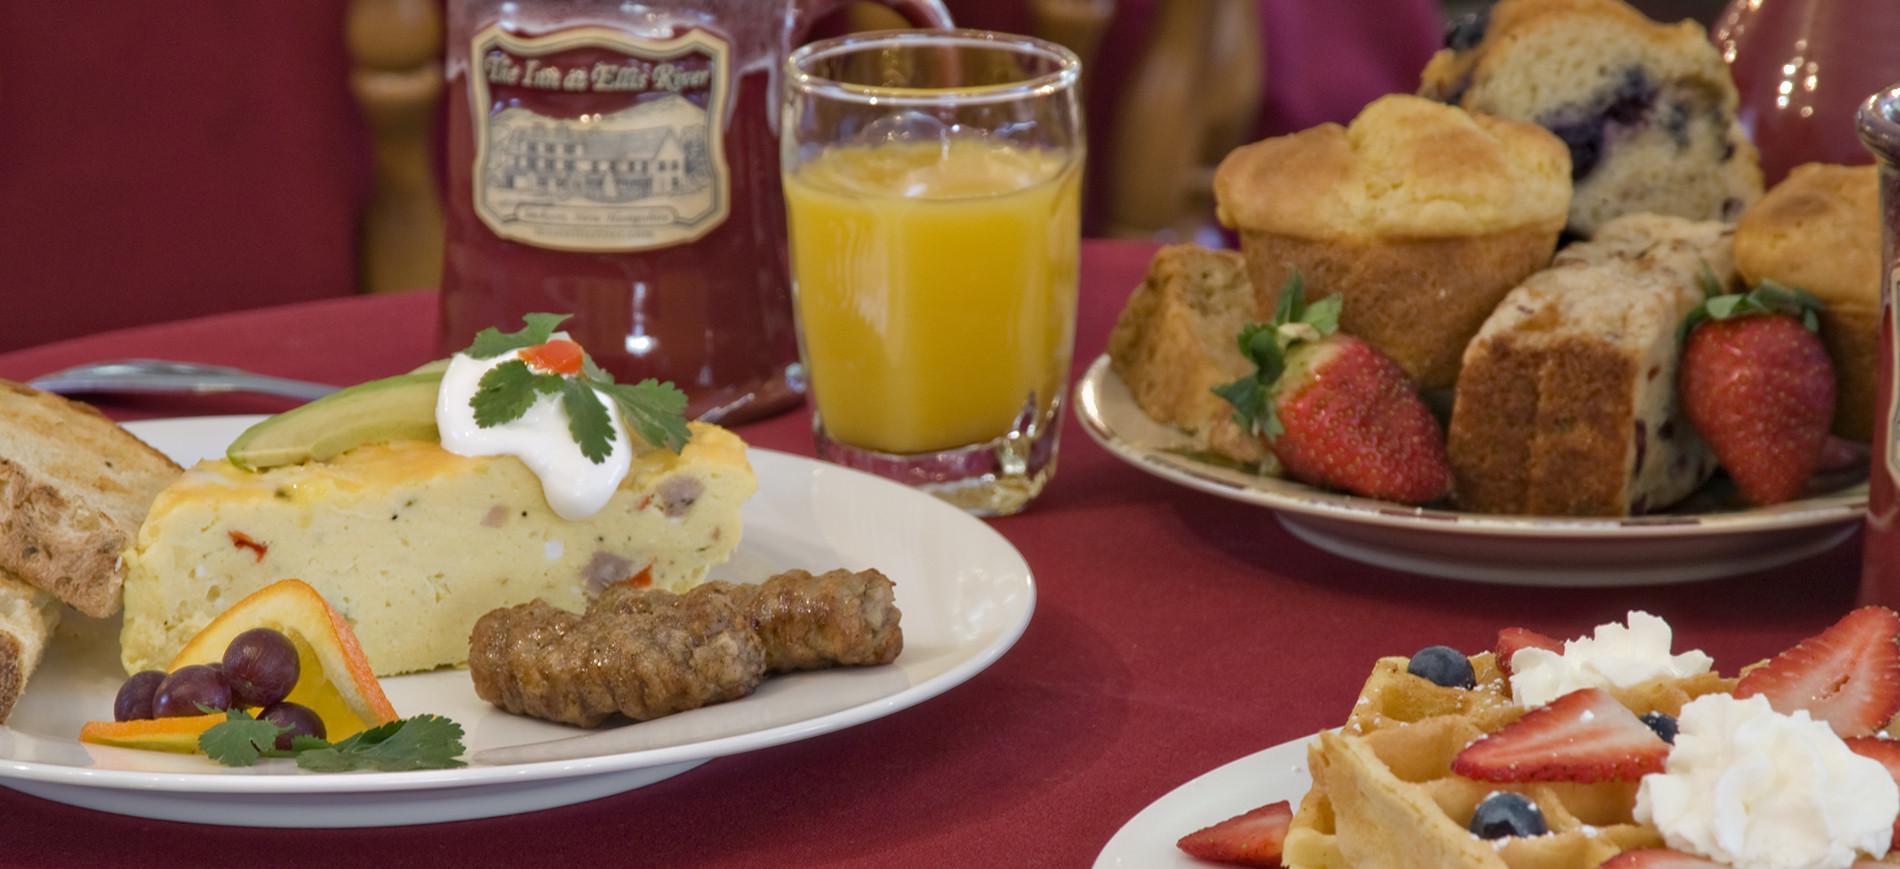 Frittat with sausage & toast on left, mug & orange juice glass, muffins, waffle with strawberry & whipped cream